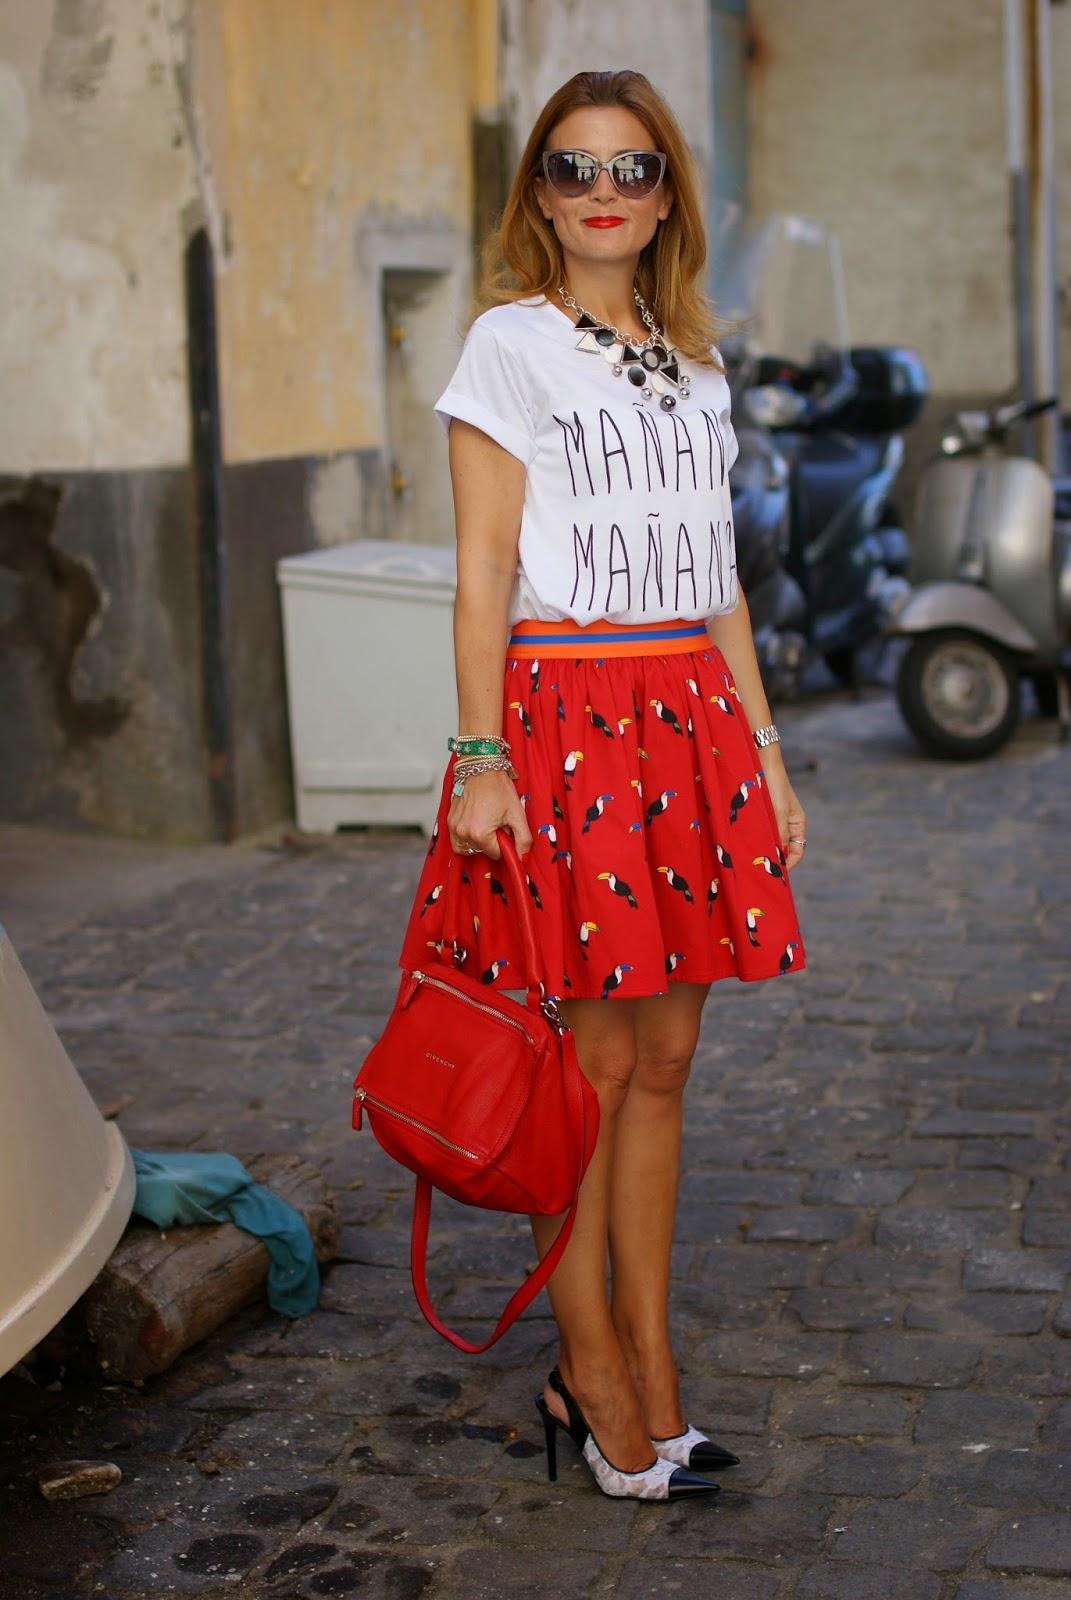 manana manana meaning, manana t-shirt, Nando Muzi shoes, Givenchy Pandora in red, Fashion and Cookies, fashion blogger